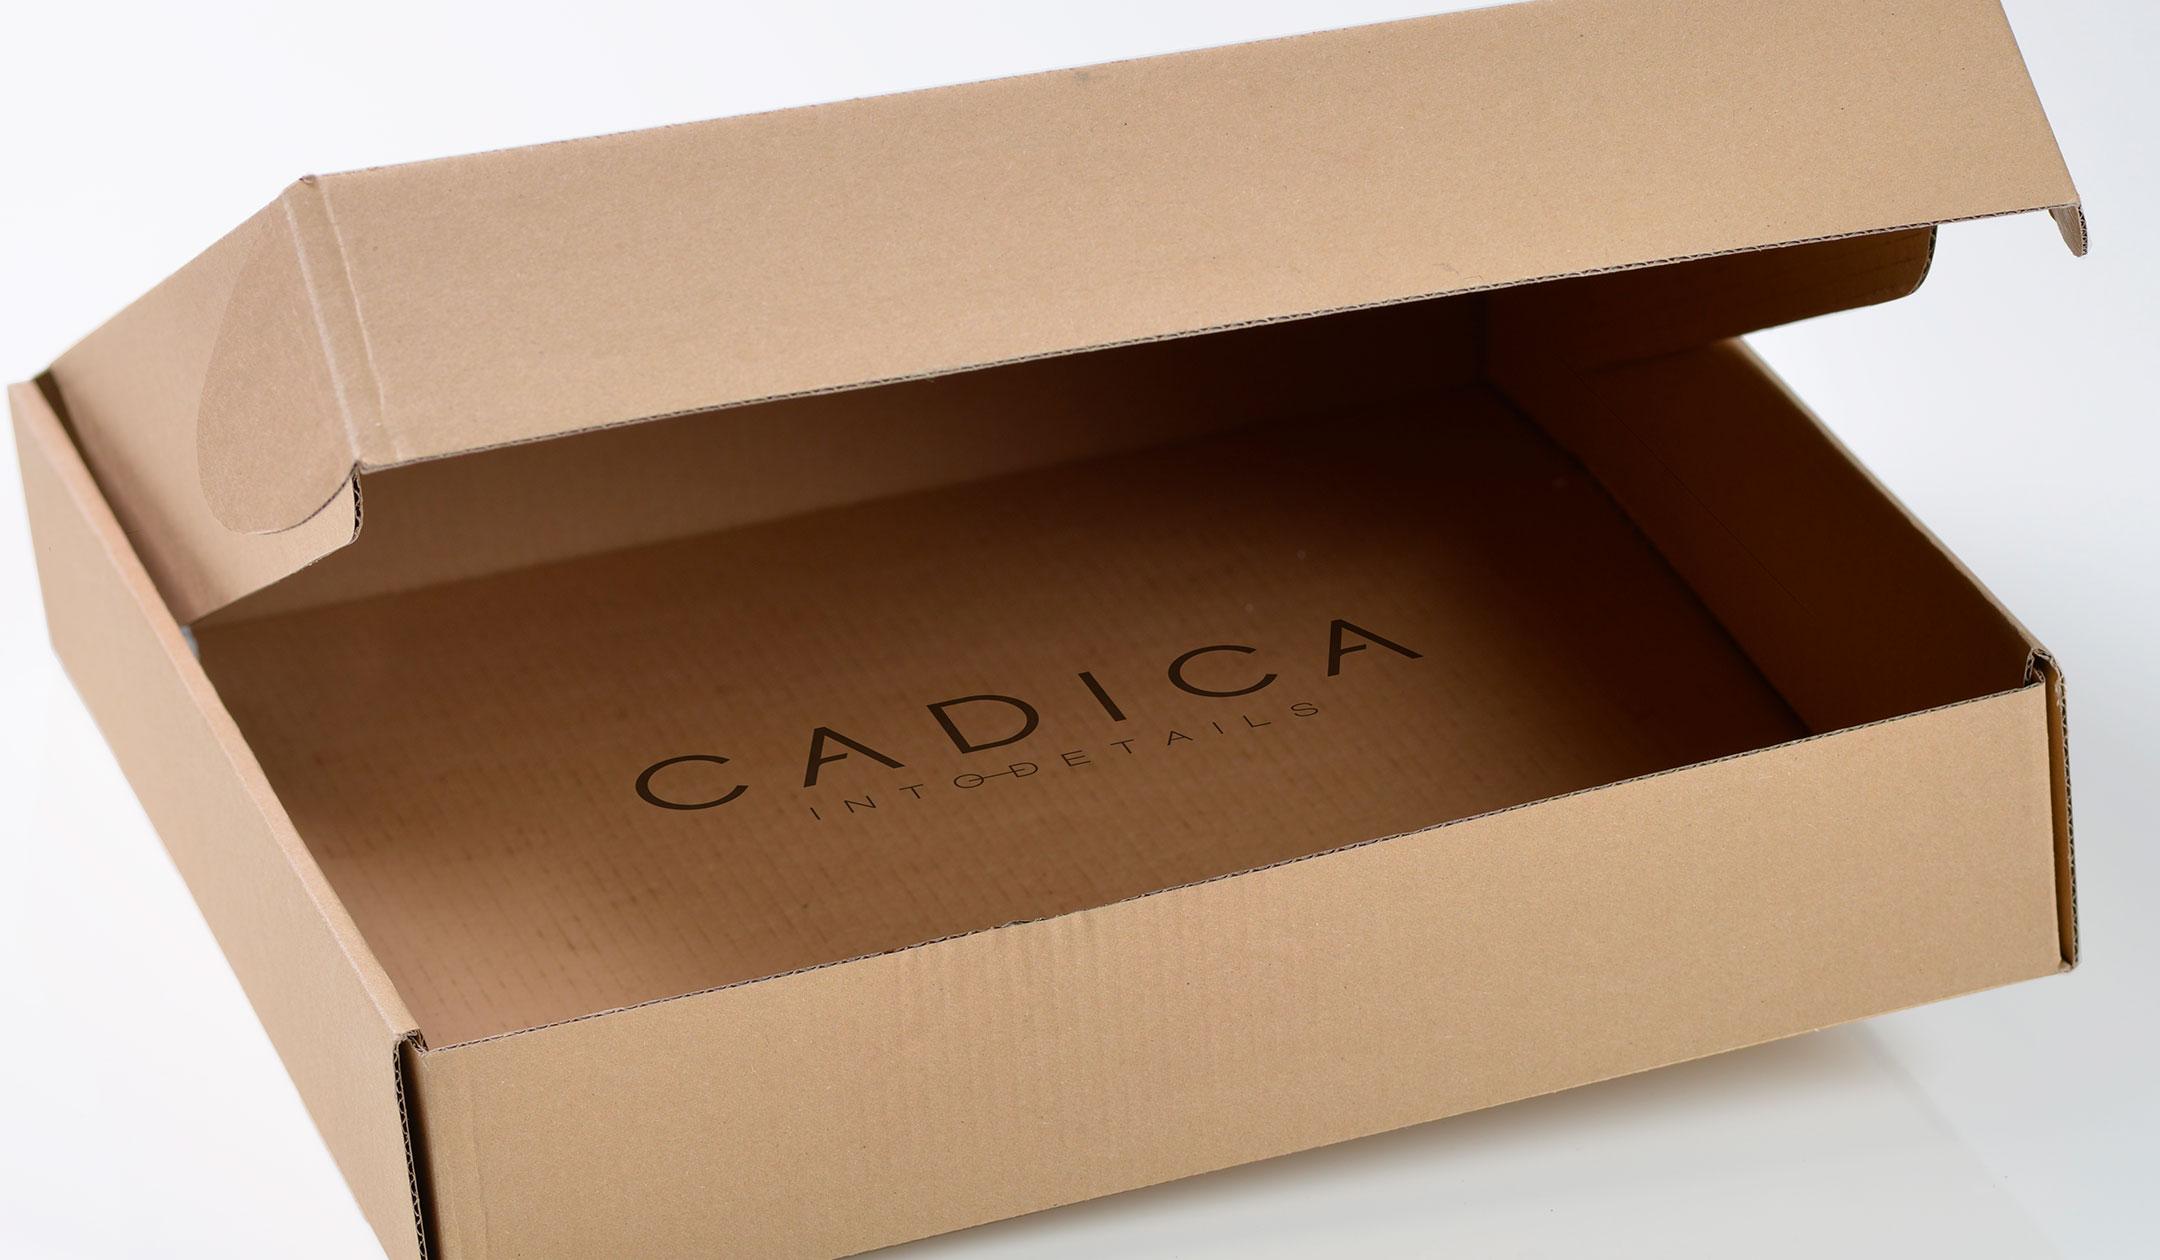 Cadica_packaging_box-avana